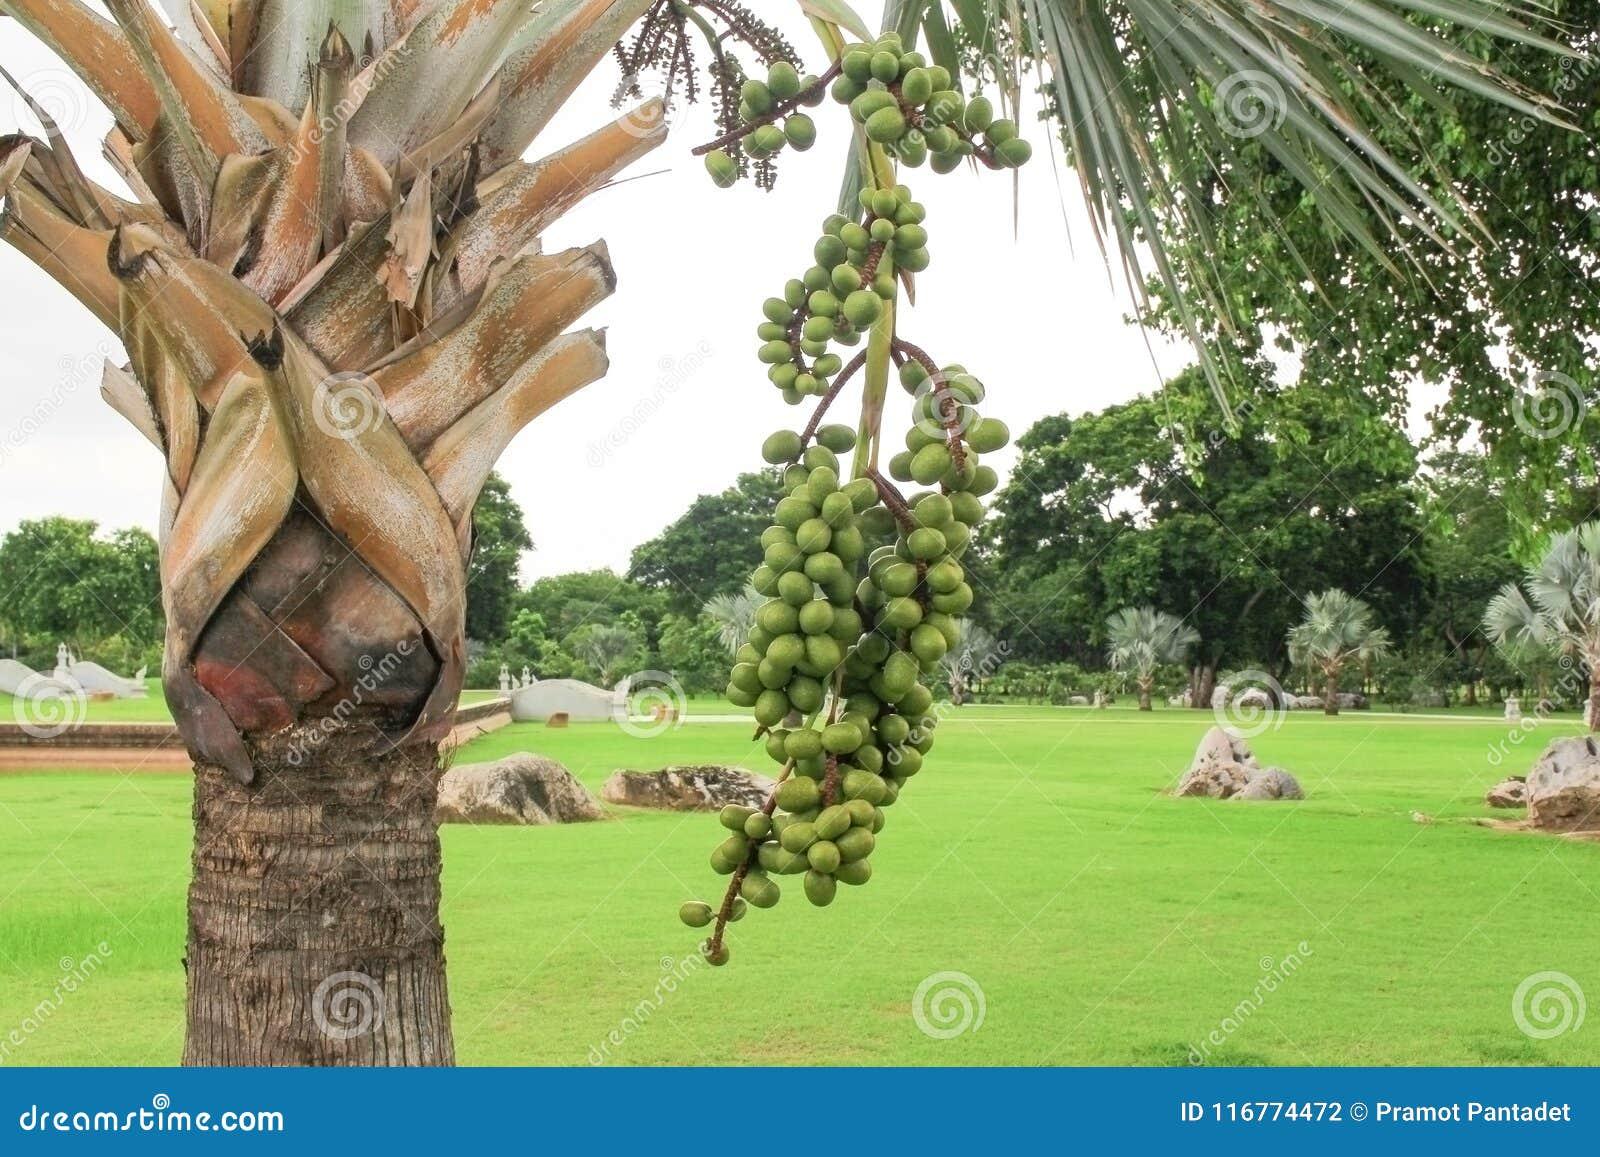 Palm fruit tree Raja Lipstick Sealing wax , Lipstick , Raja , Maharajah ornamental plant in garden on white background